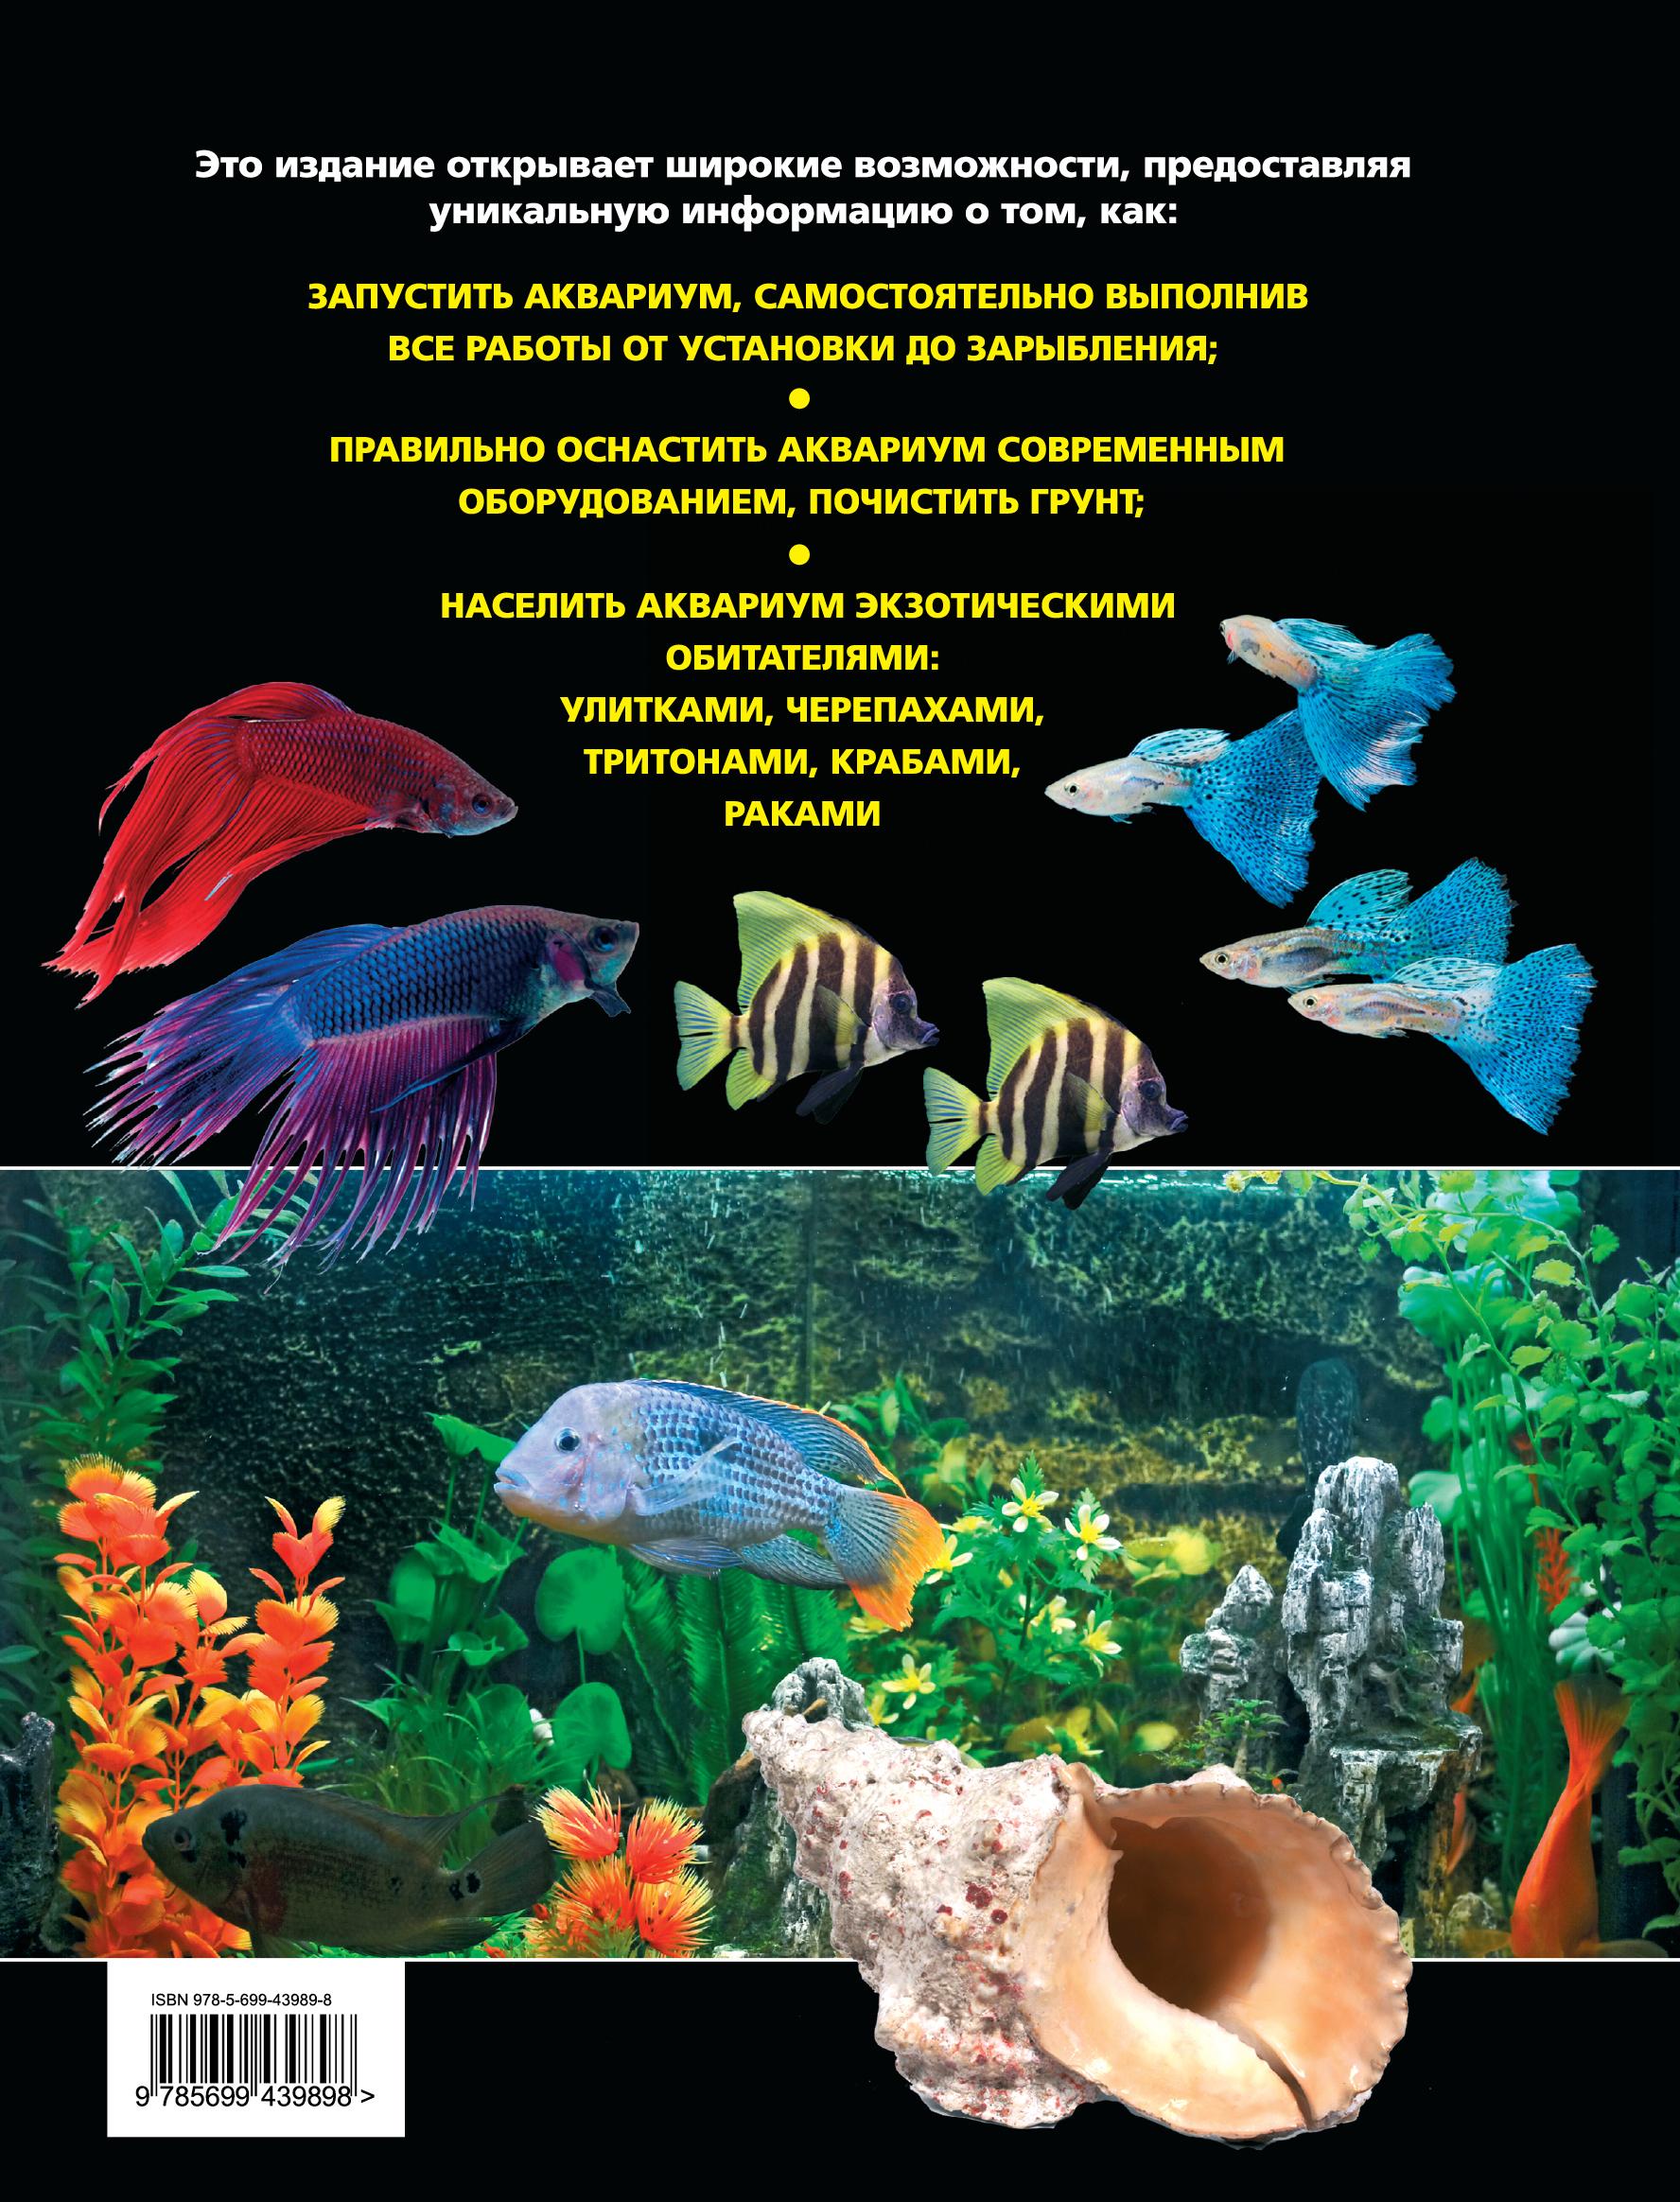 Легкий аквариум. Школа домашнего аквариумиста